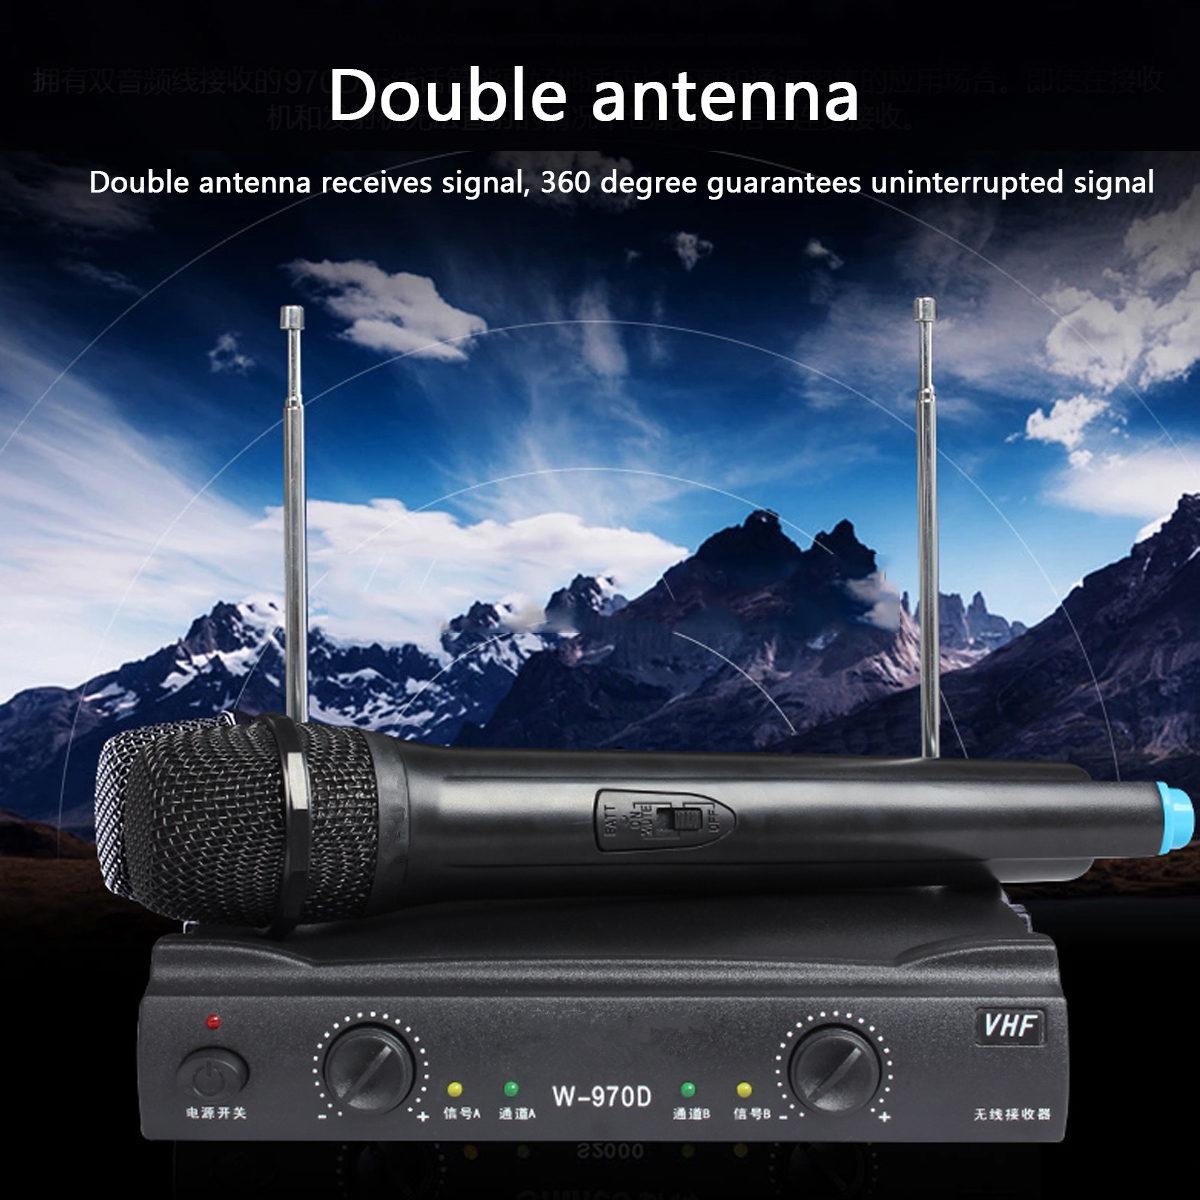 Professional Karaoke Radio Wireless Handheld VHF Transmitter Microphone Set with 2 Mic 1 Receiver for KTV Speech Performances